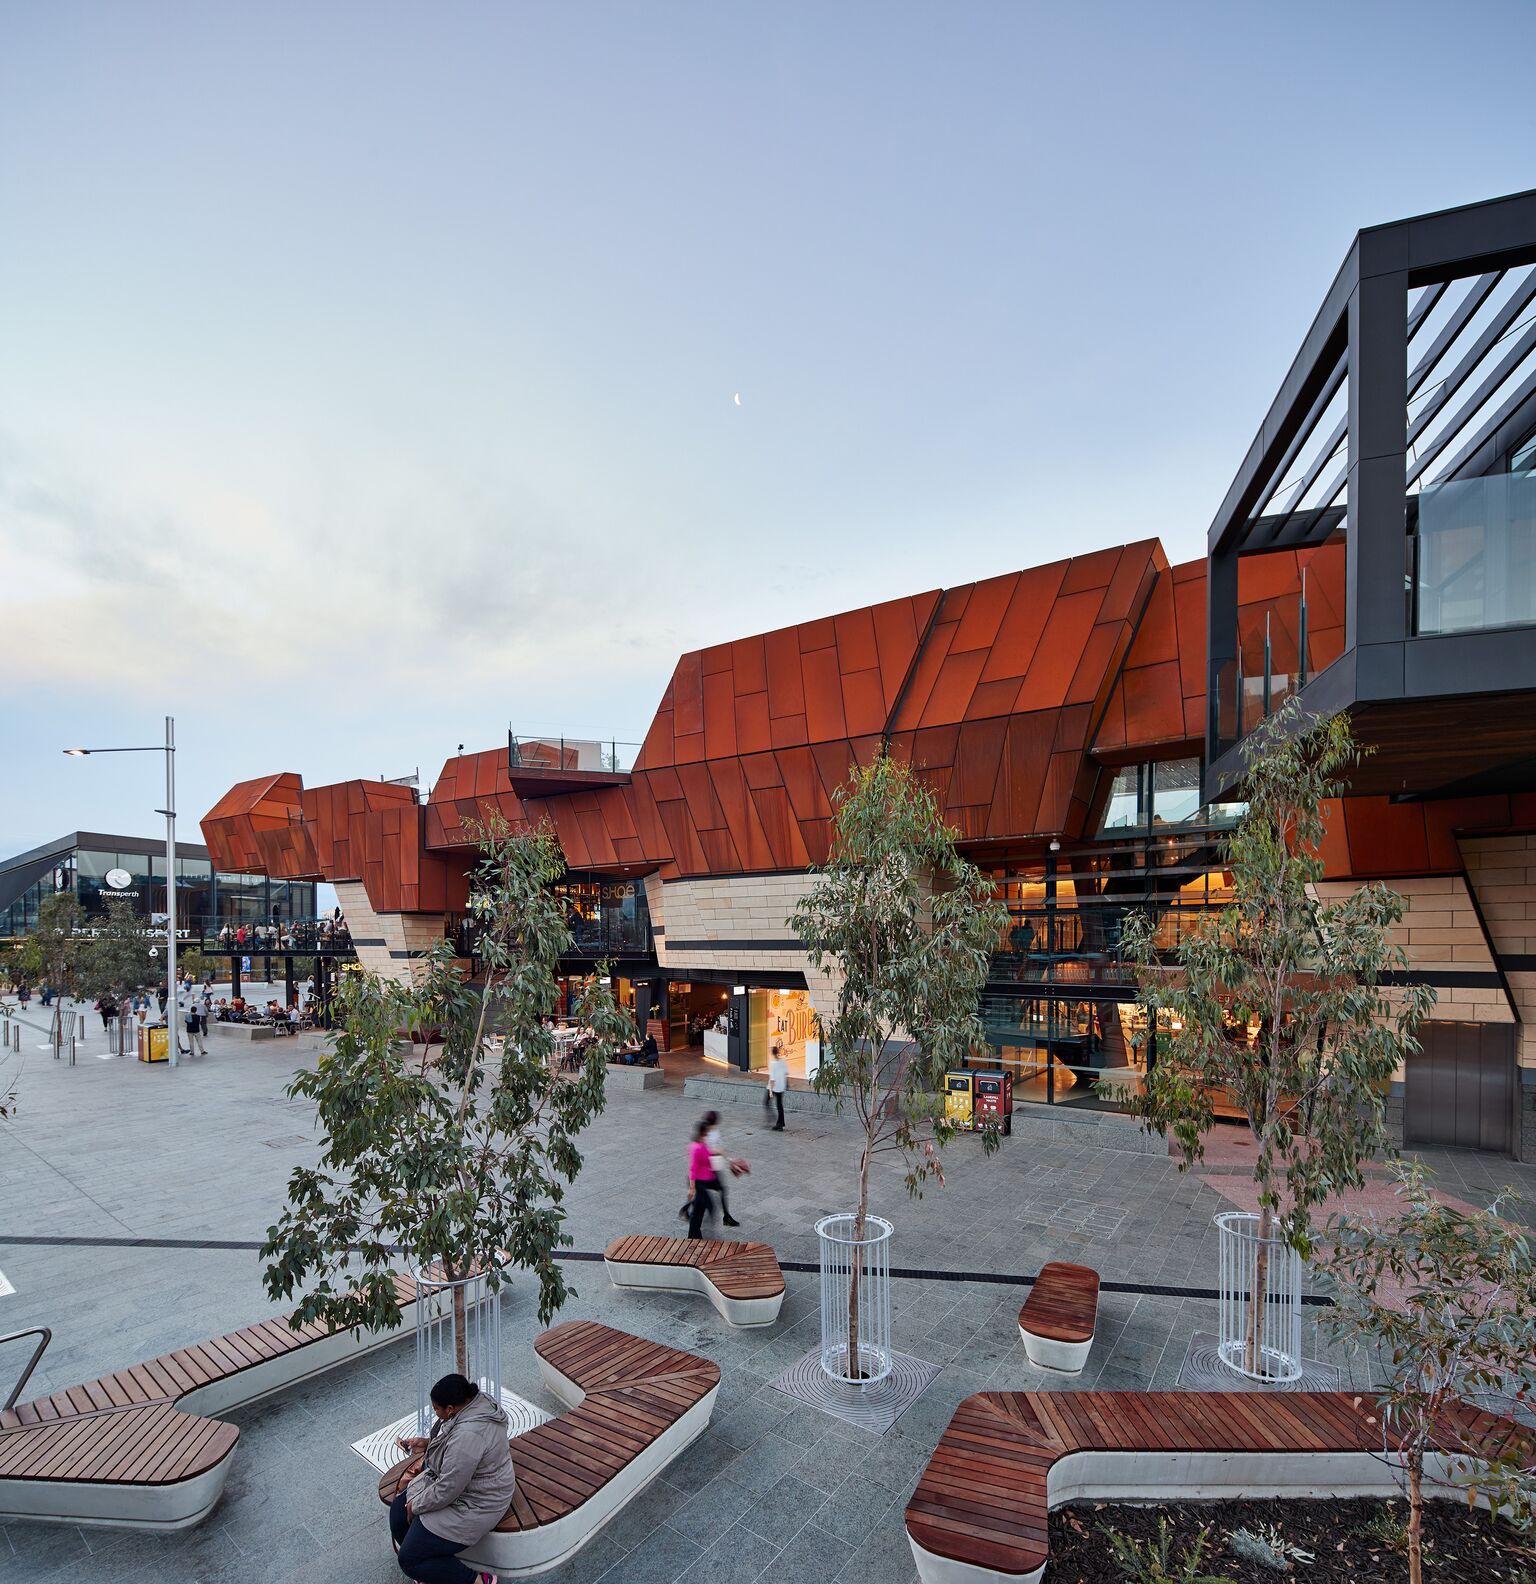 Yagan Square in Perth